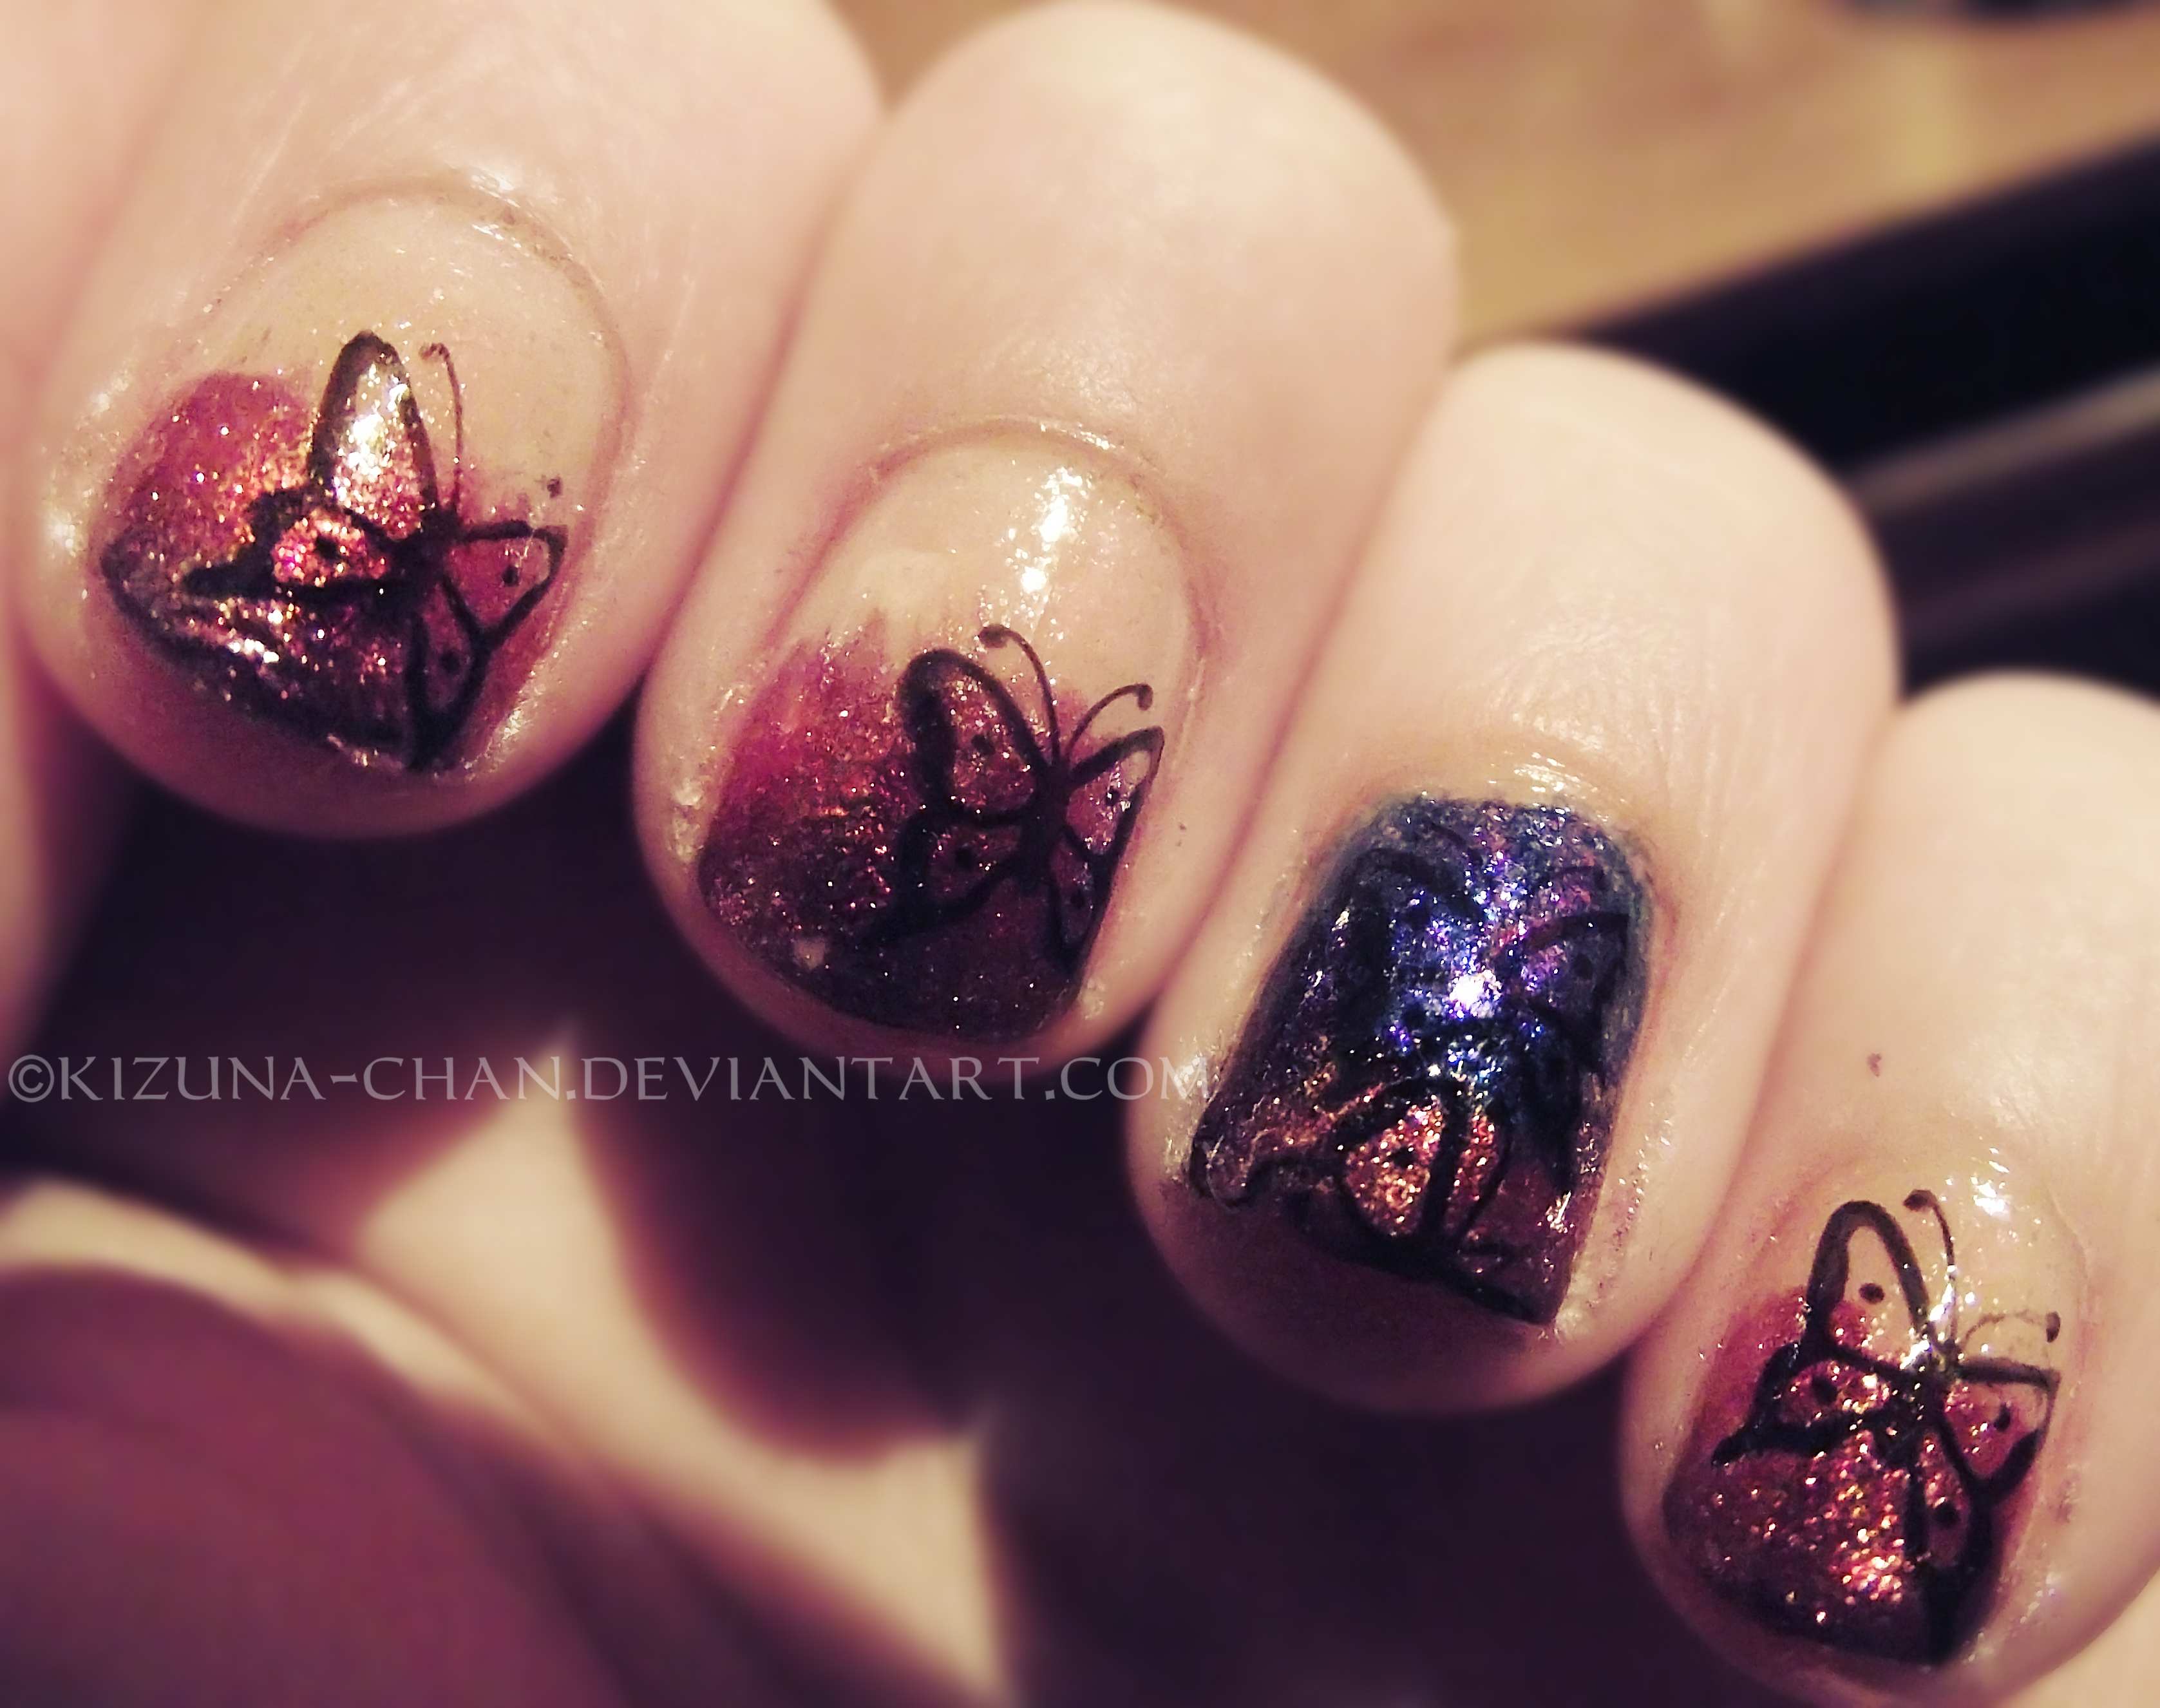 Butterfly Nail Art by Kizuna-chan